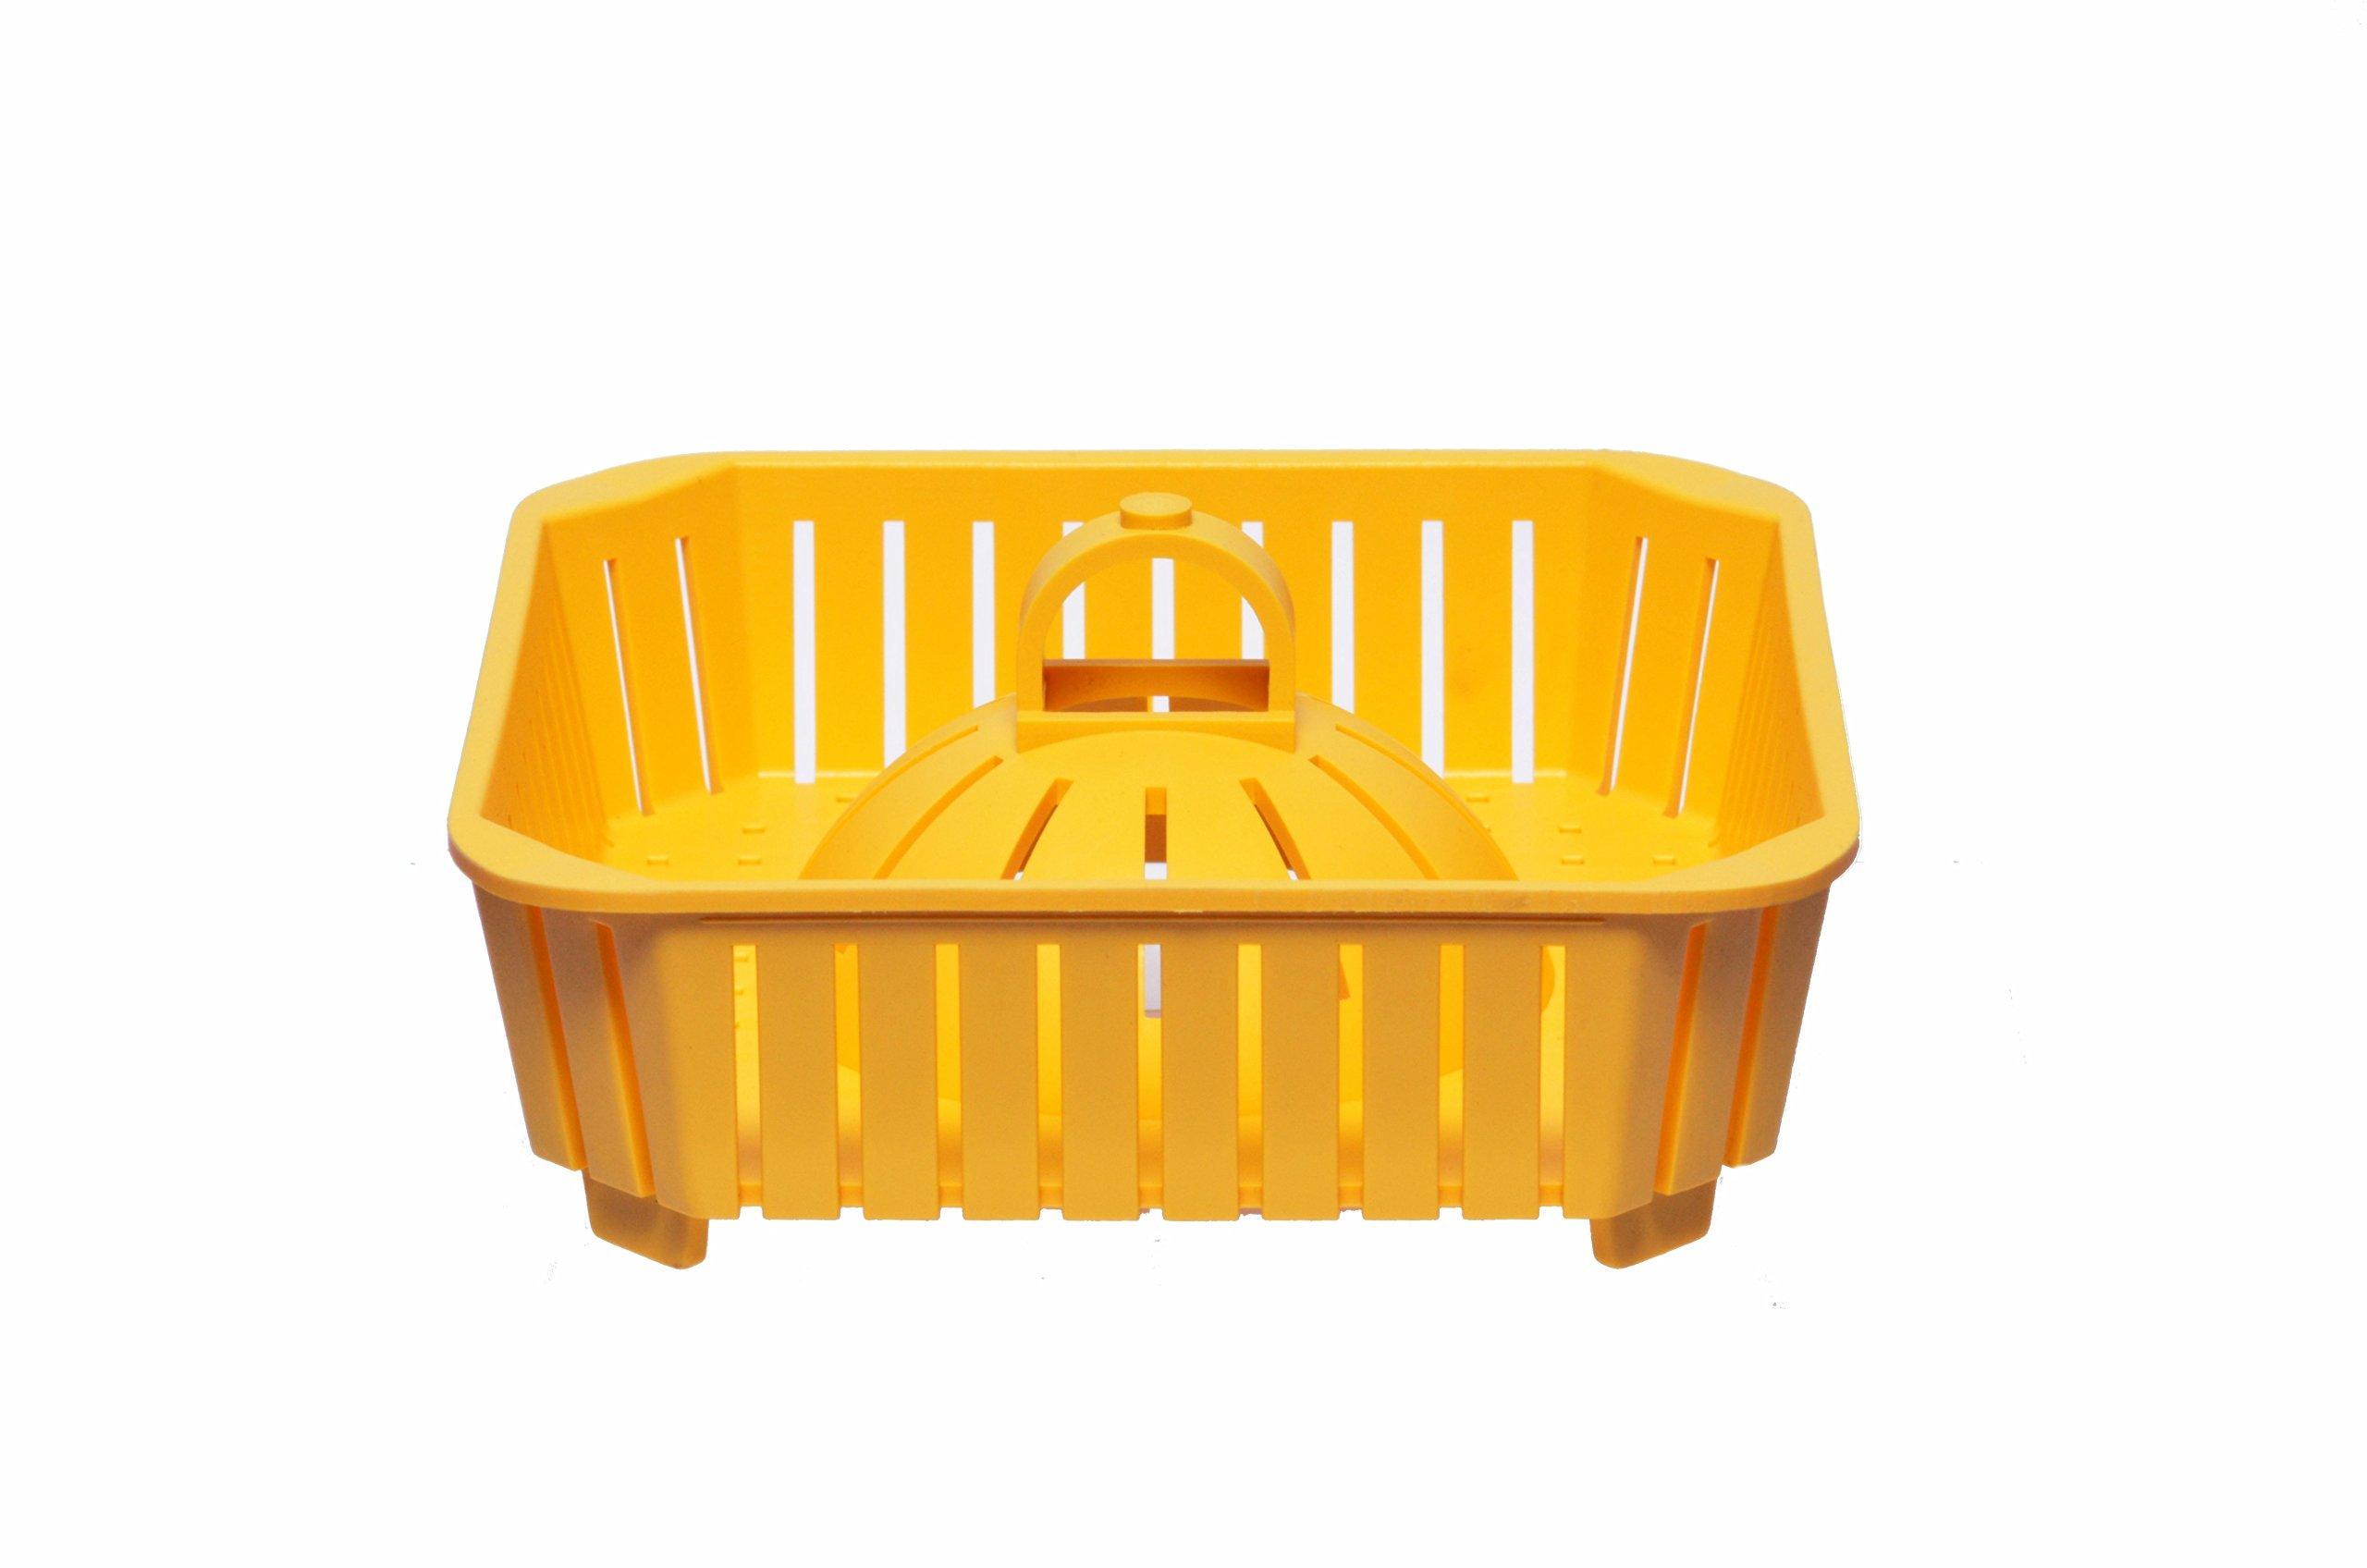 8 Inch PermaDrain Safety Strainer Basket. Fits 12 Inch Floor Sinks. For Zurn, Oatey, Wade, Josam, Smith, and Other Floor Sink Brands.